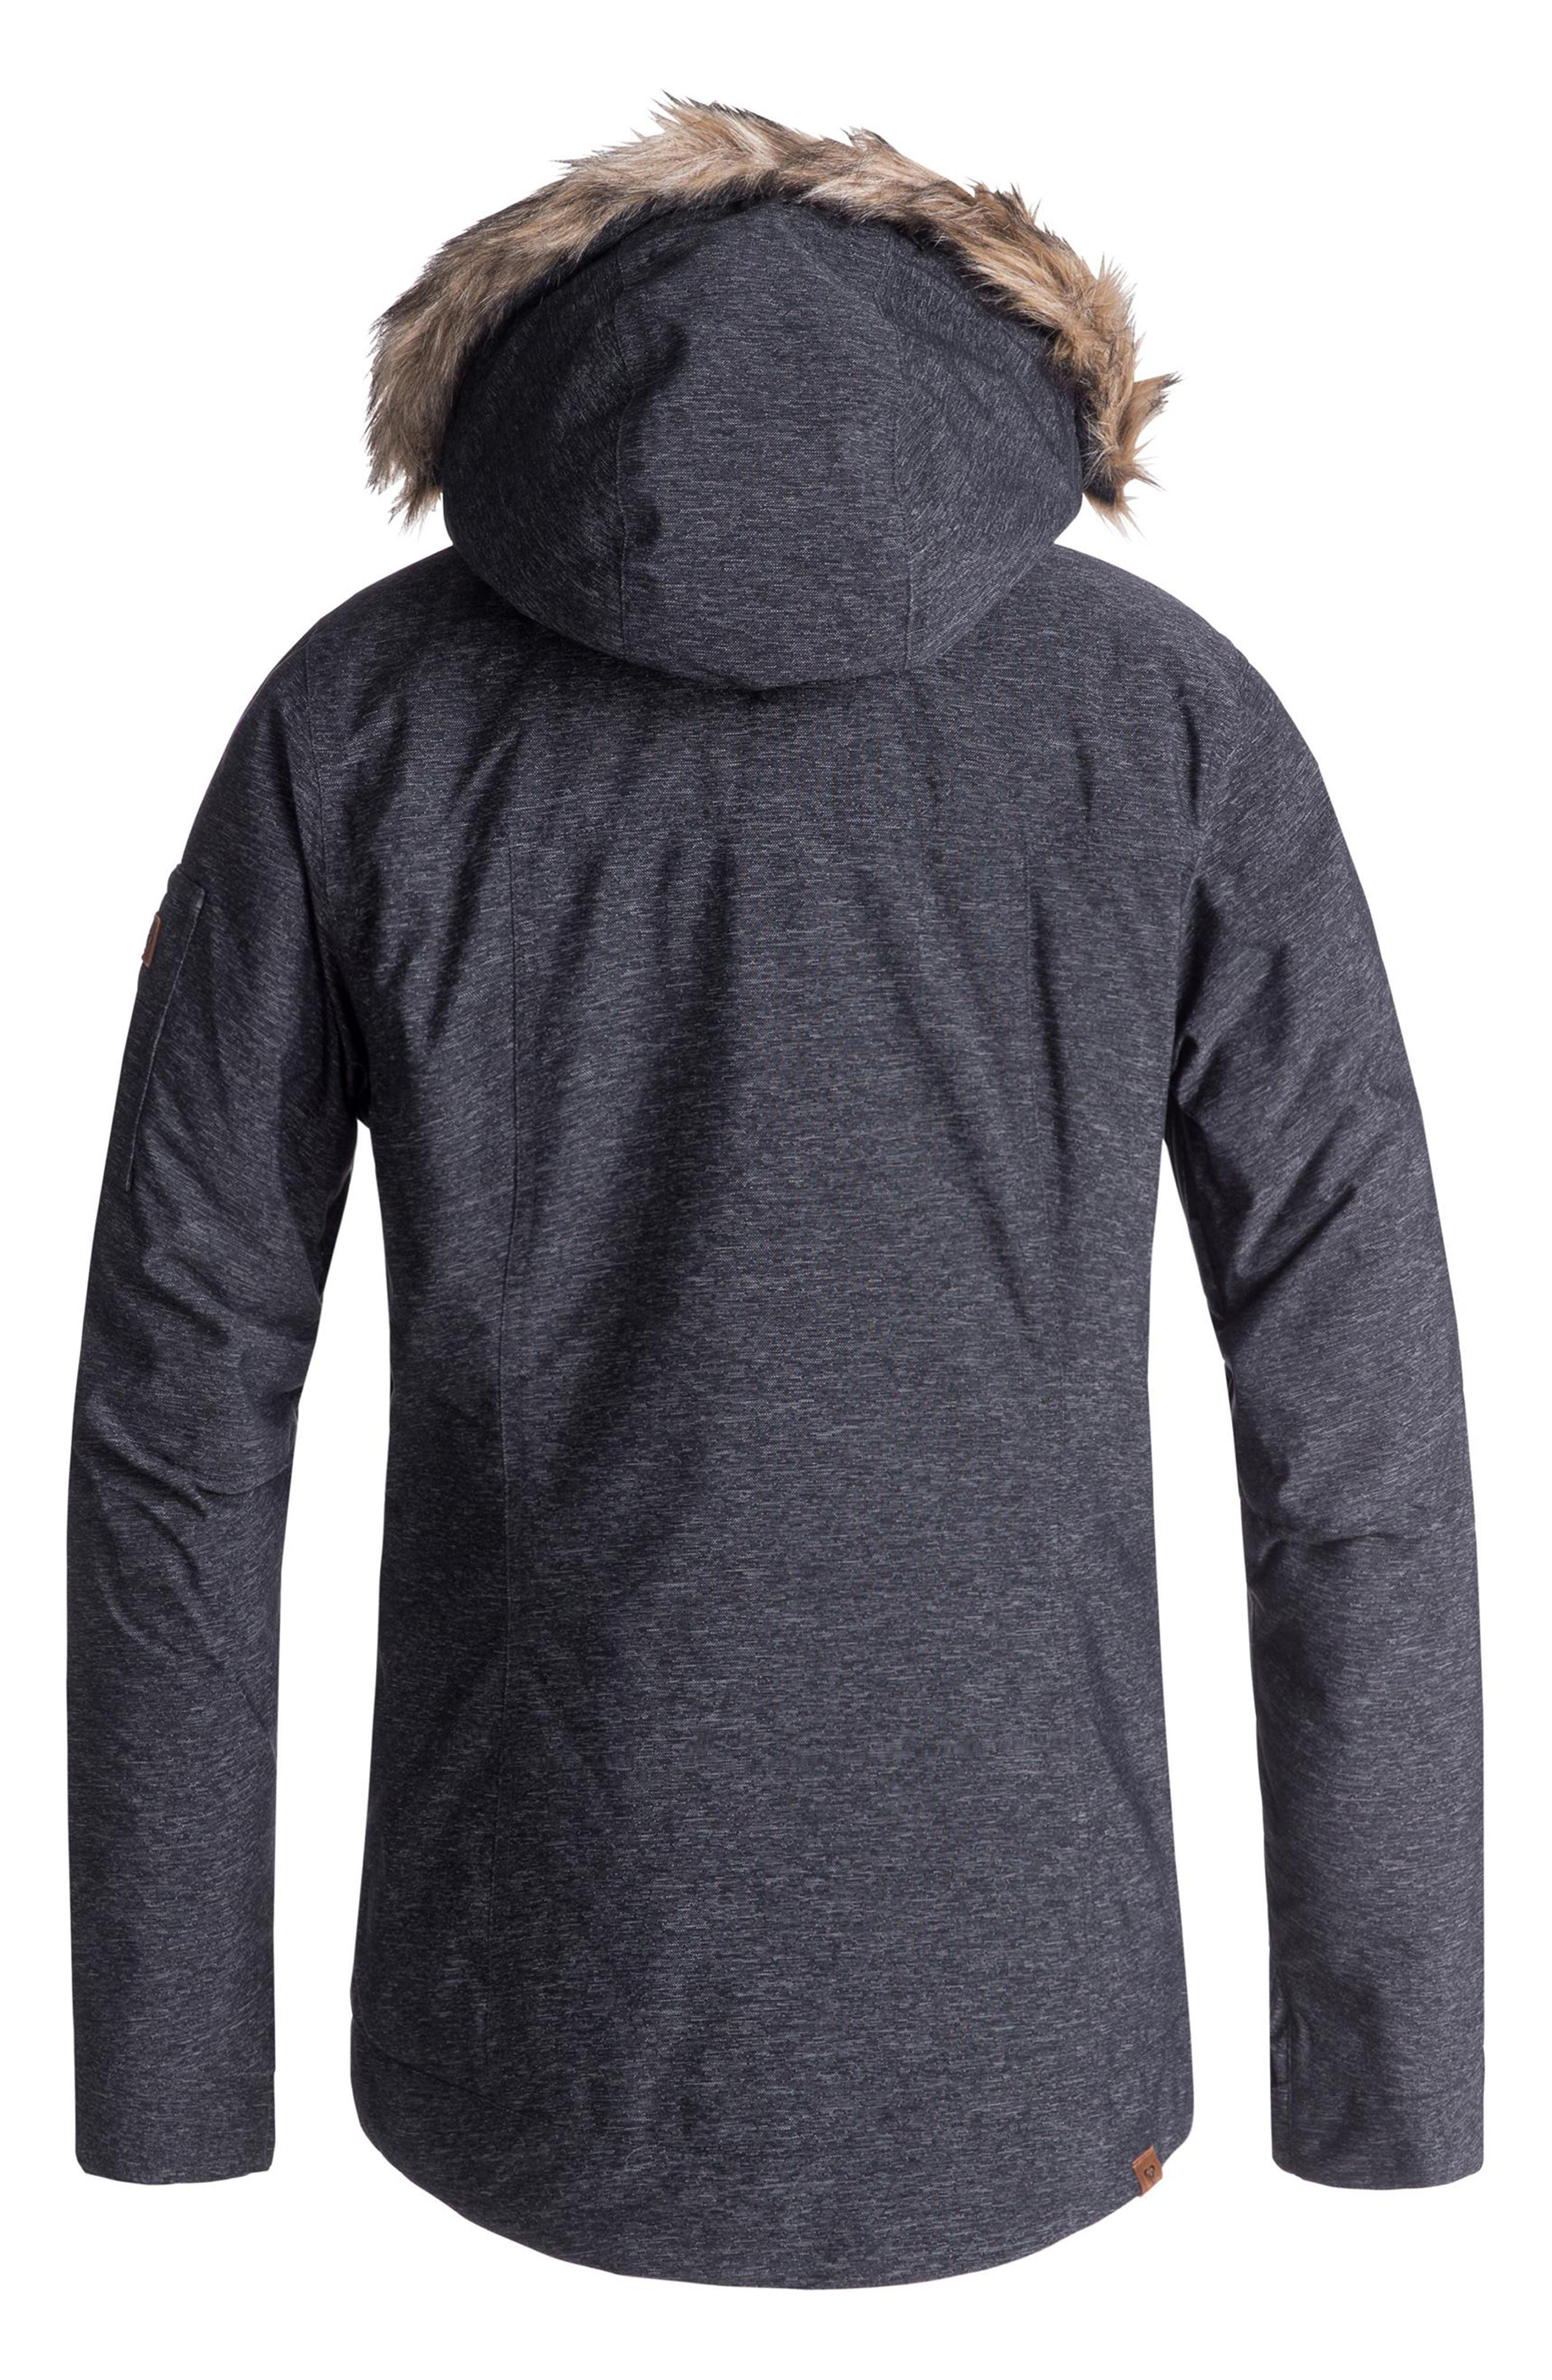 Meade Snow Jacket,                             Alternate thumbnail 3, color,                             TRUE BLACK